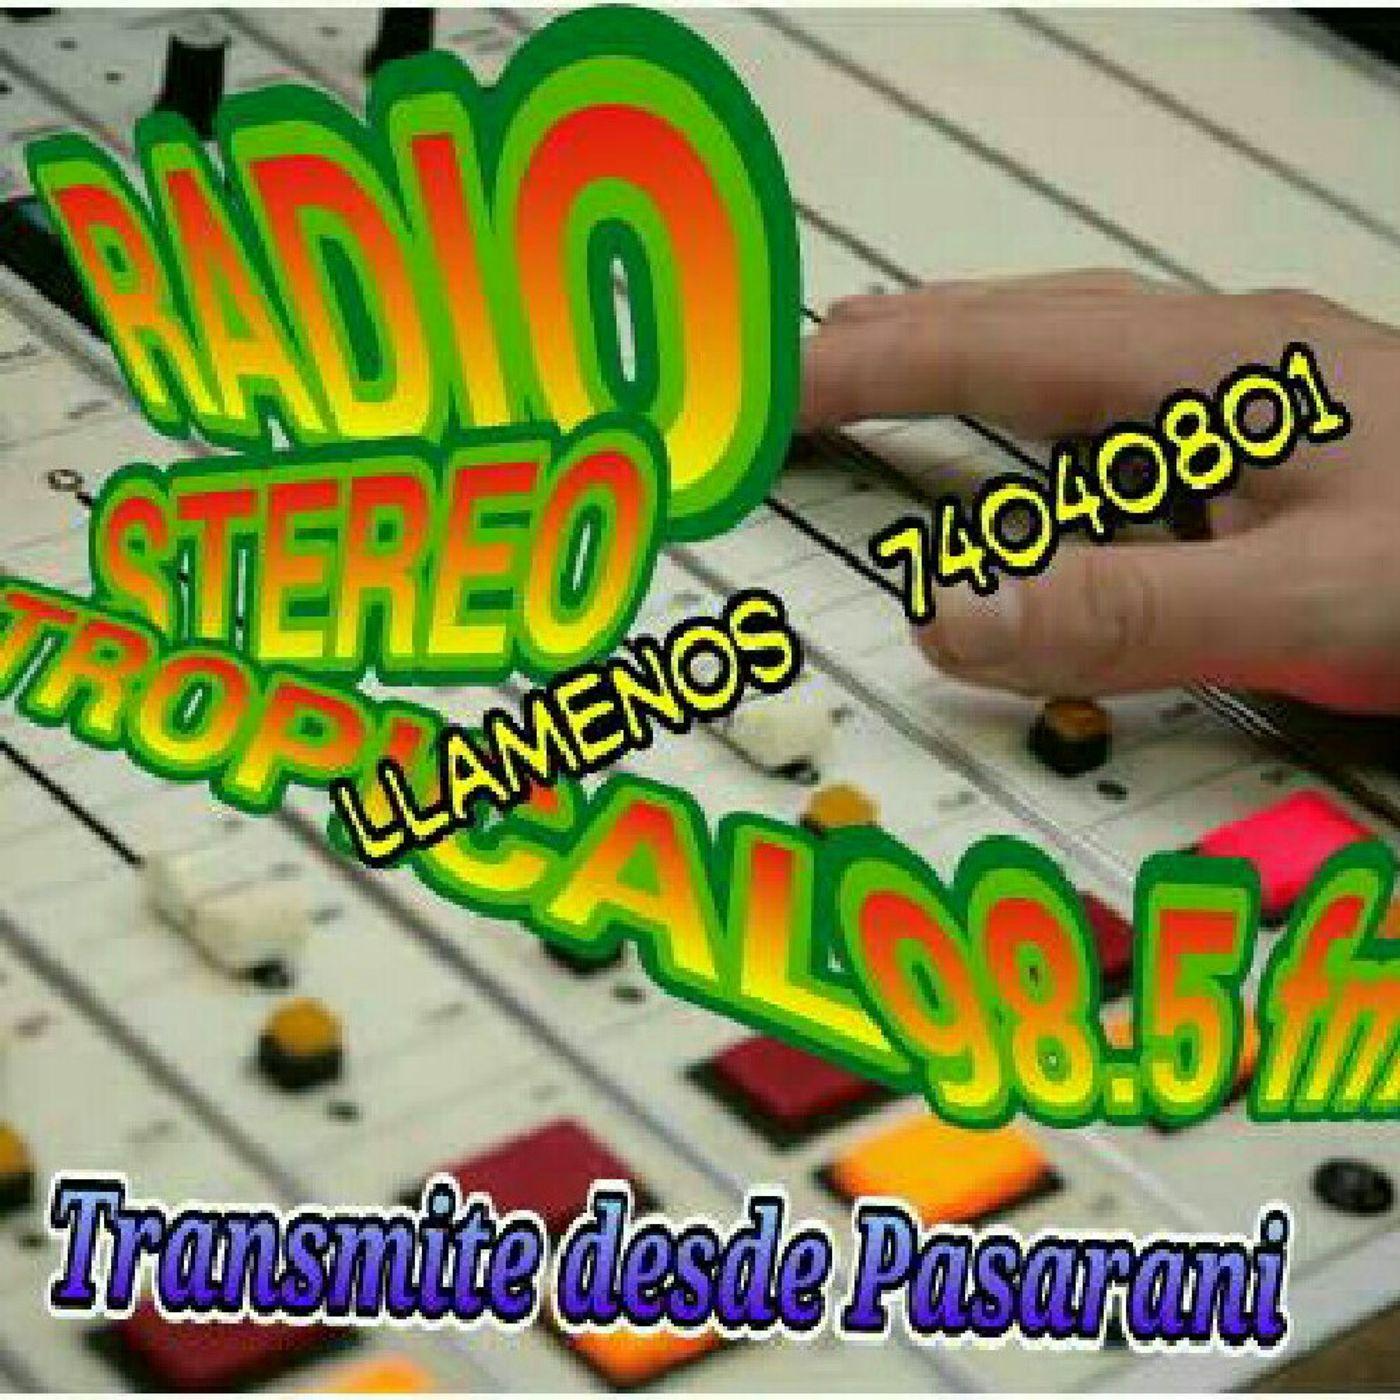 Radio Stereo Tropical Fm. Pasarani